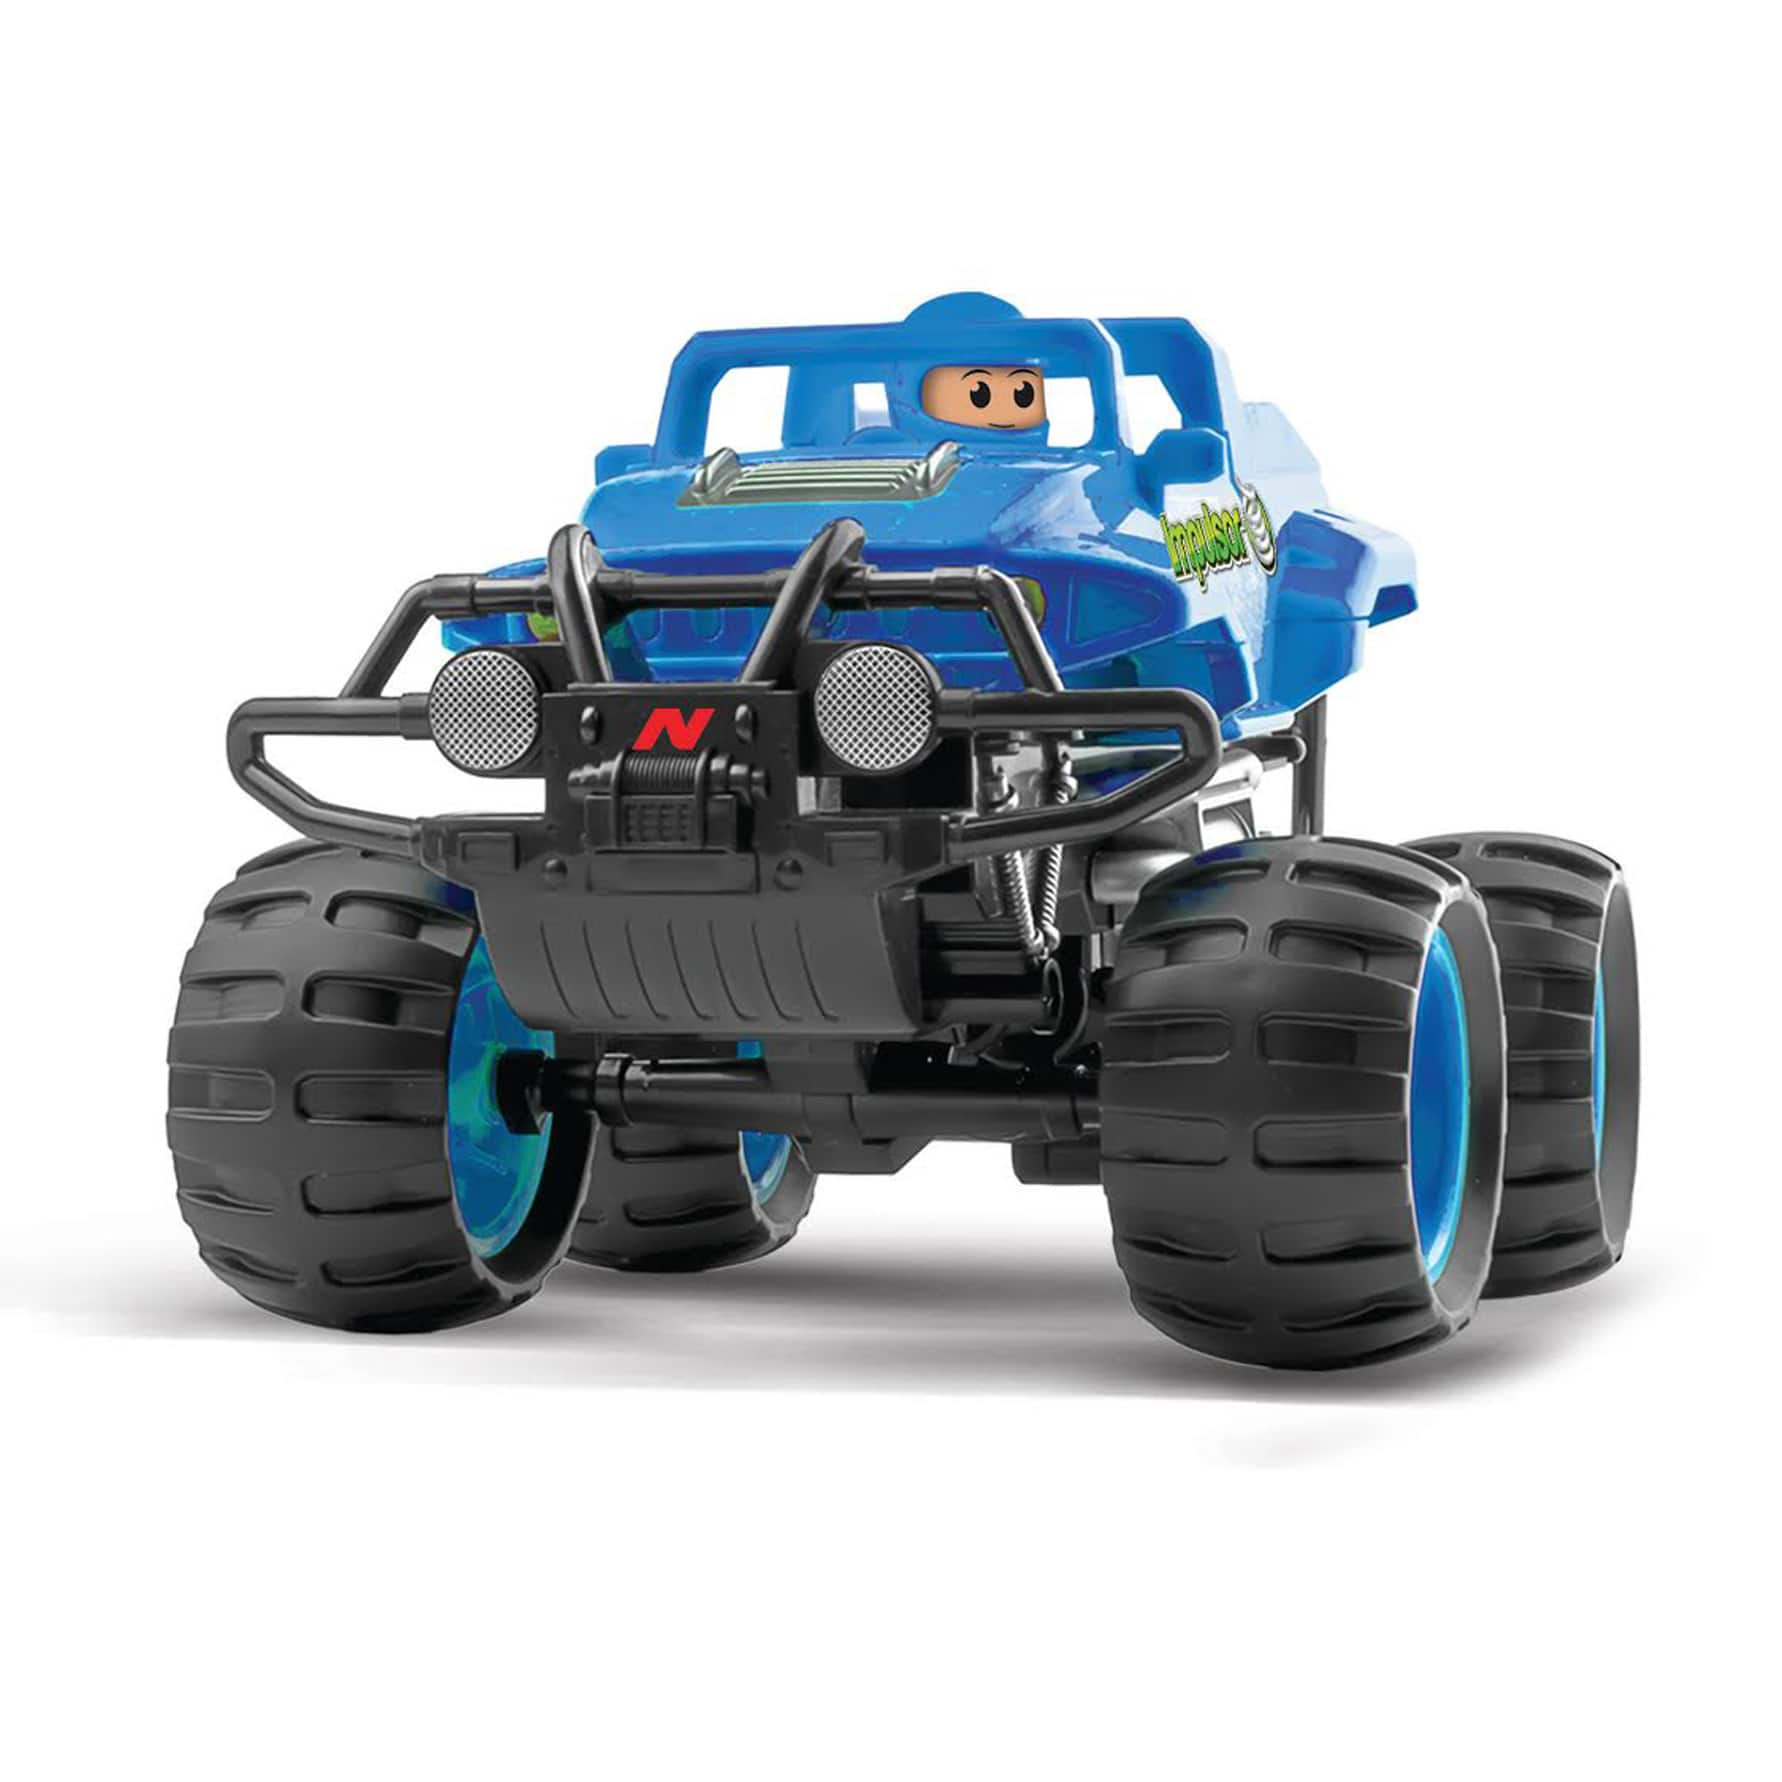 Ninco Kid Racers Build Your Own Impulsor Rc Car Blue Walmart Com